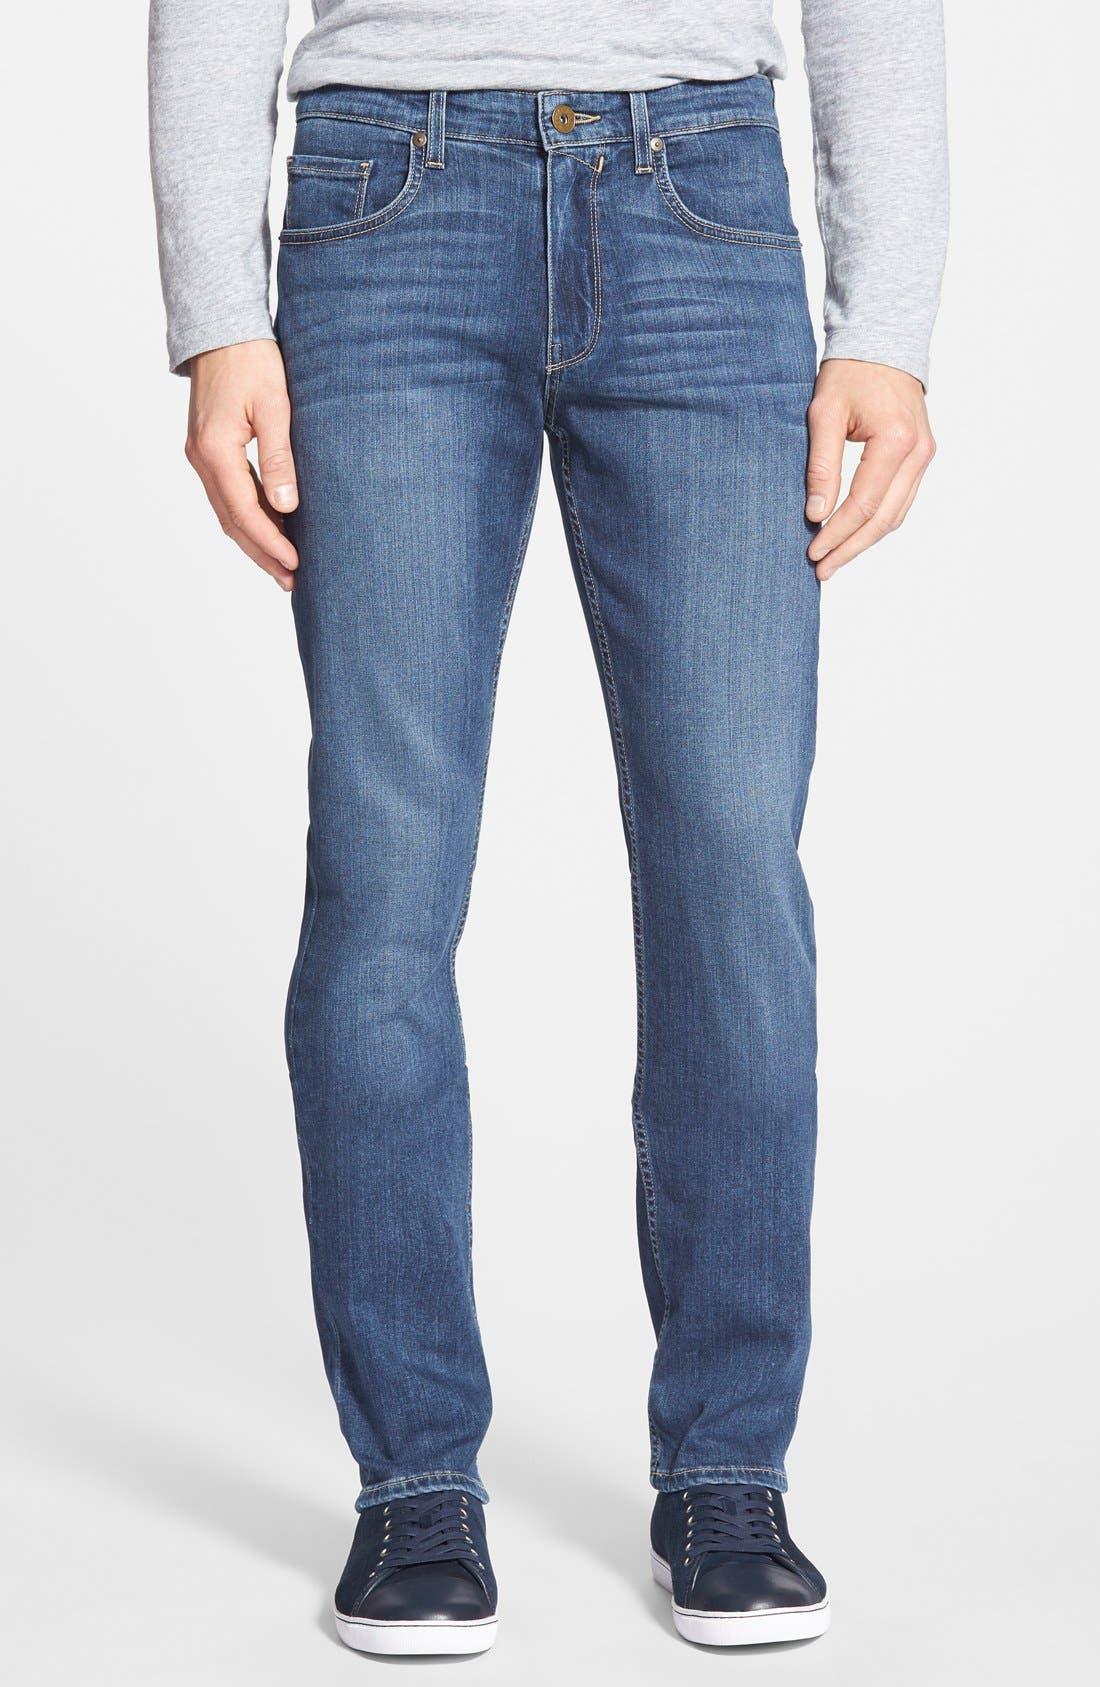 PAIGE Transcend - Federal Slim Straight Leg Jeans, Main, color, BIRCH